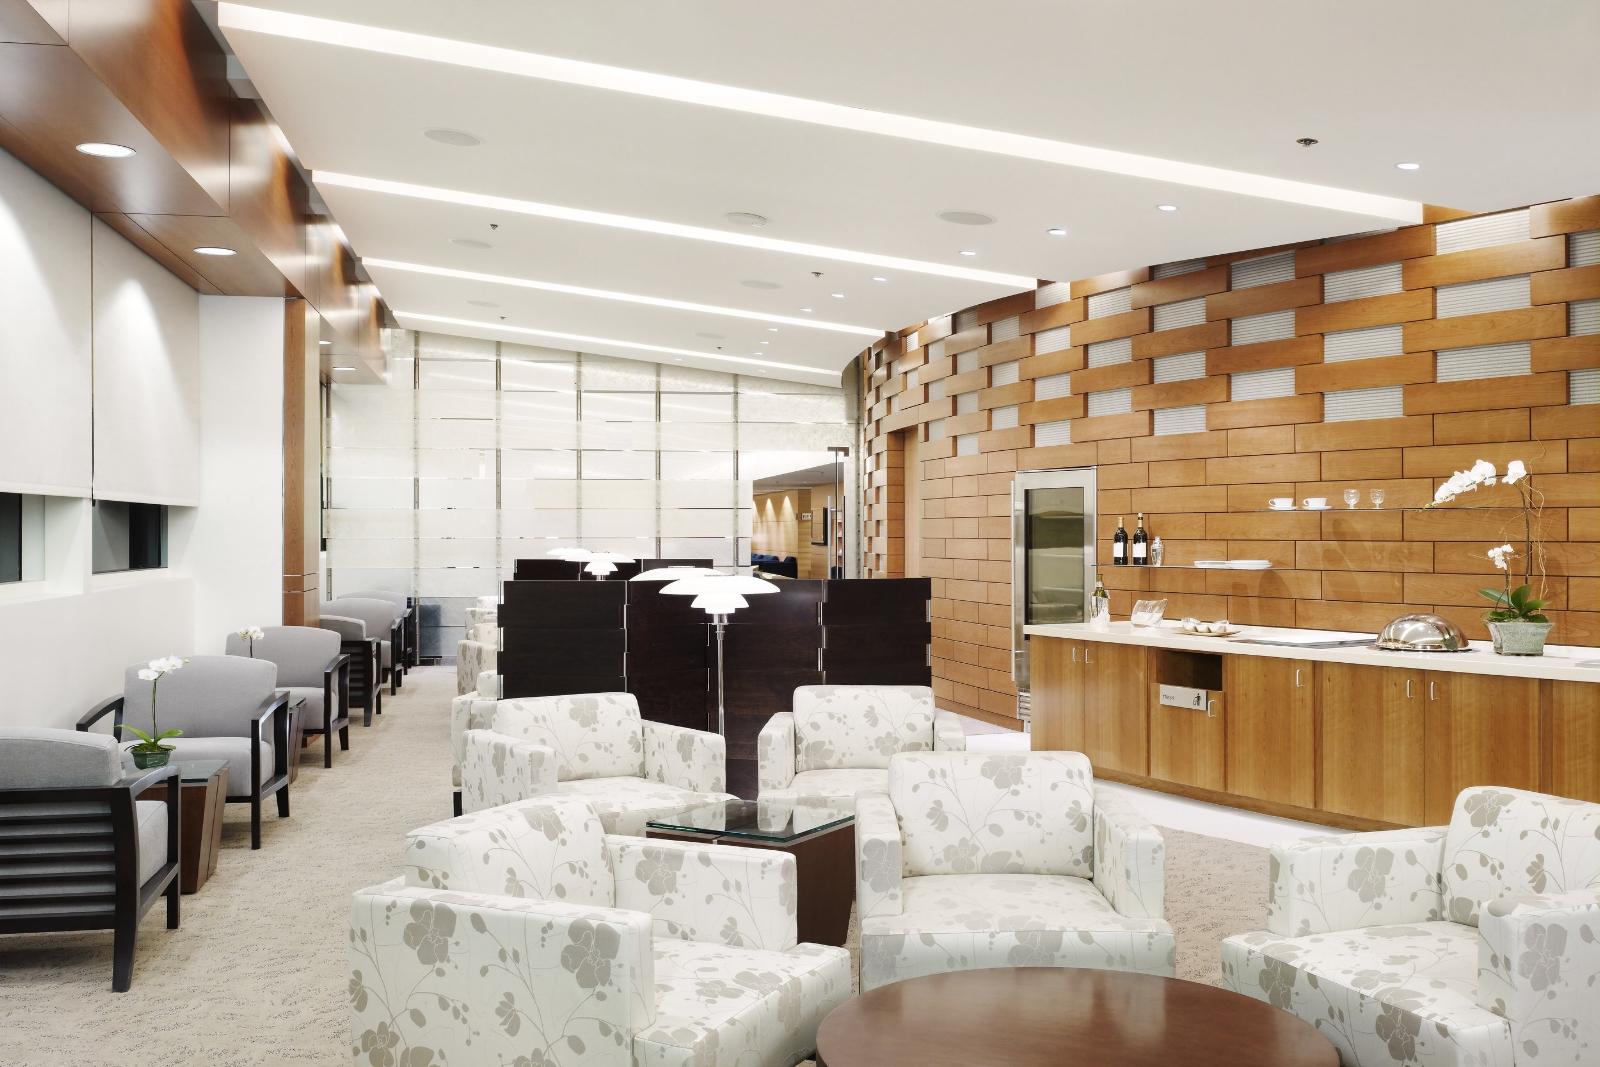 Skyteam Alliance Lounge - Los Angeles, CA